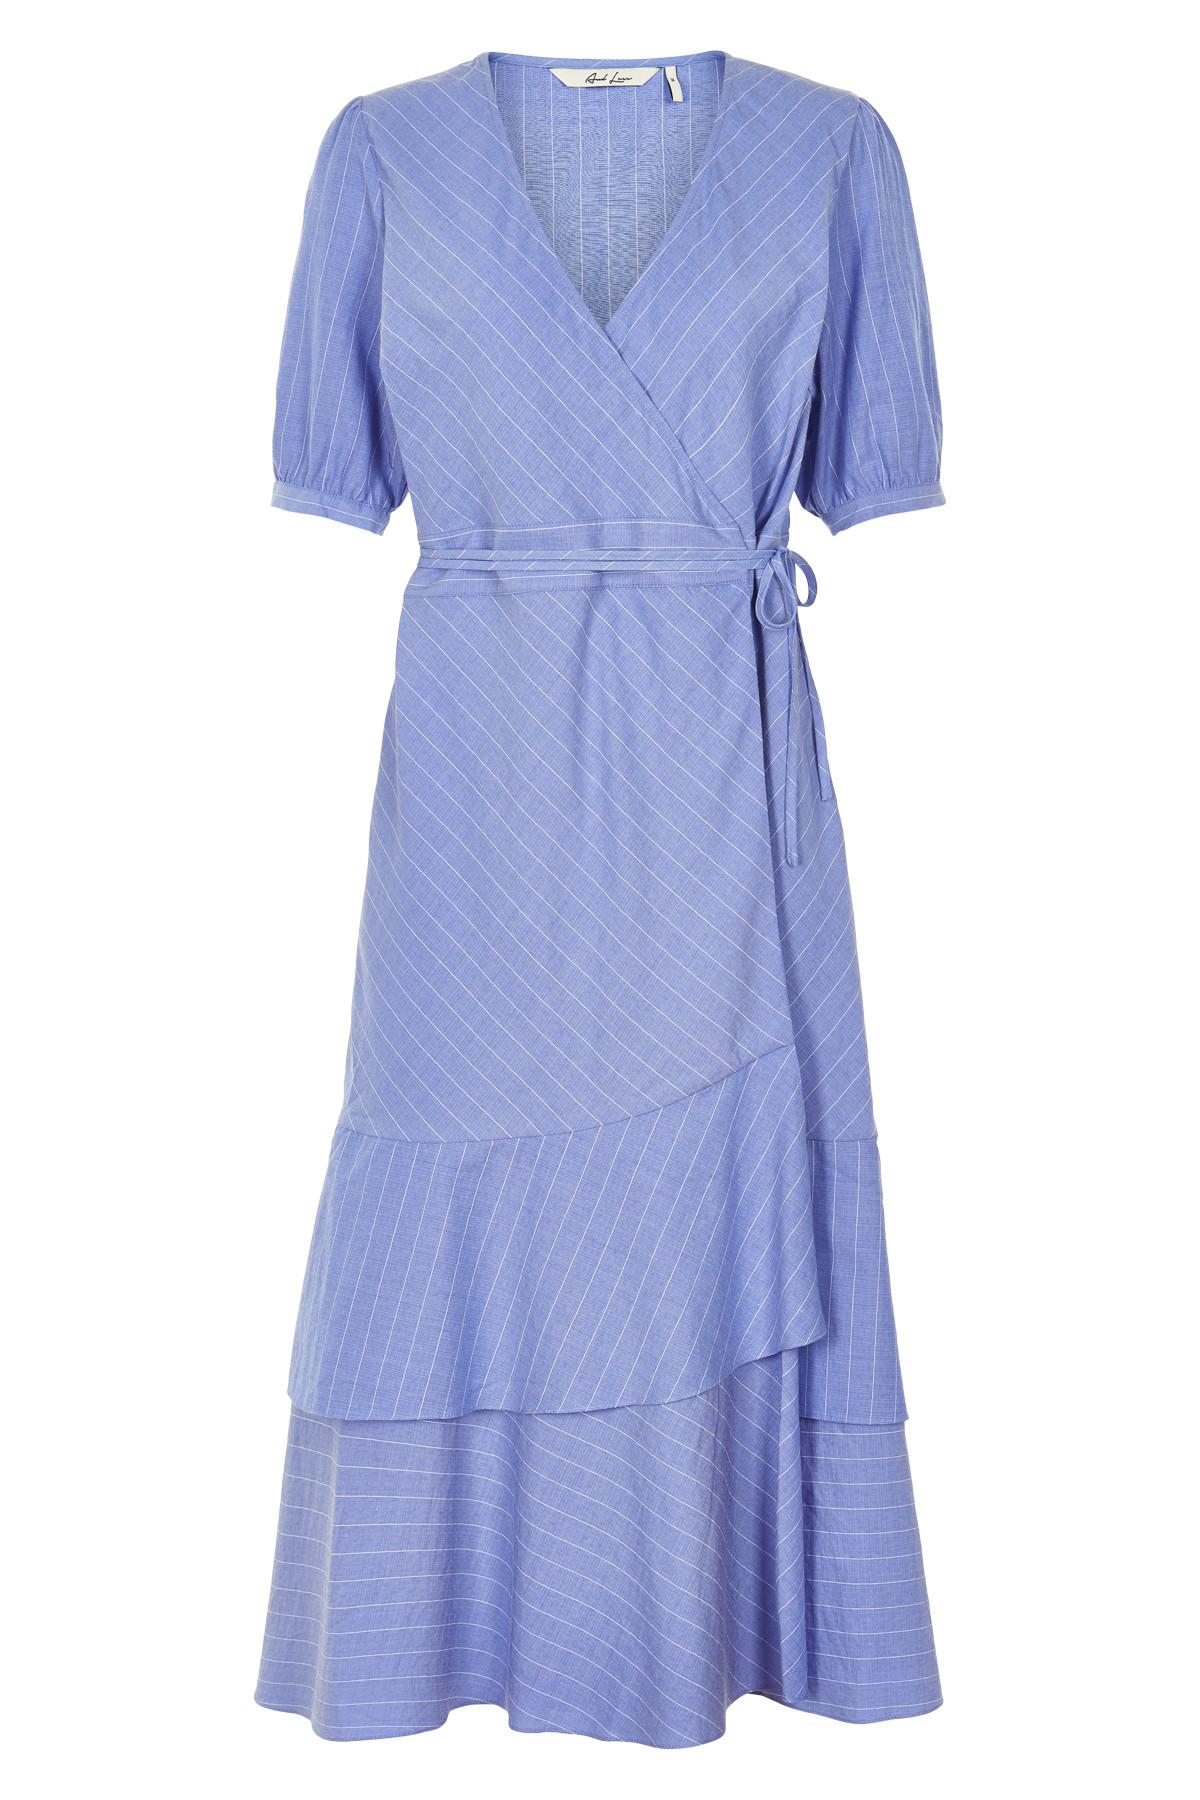 Image of   AND LESS PIOLAA KJOLE 5219803 (Blue Stripe, 40)